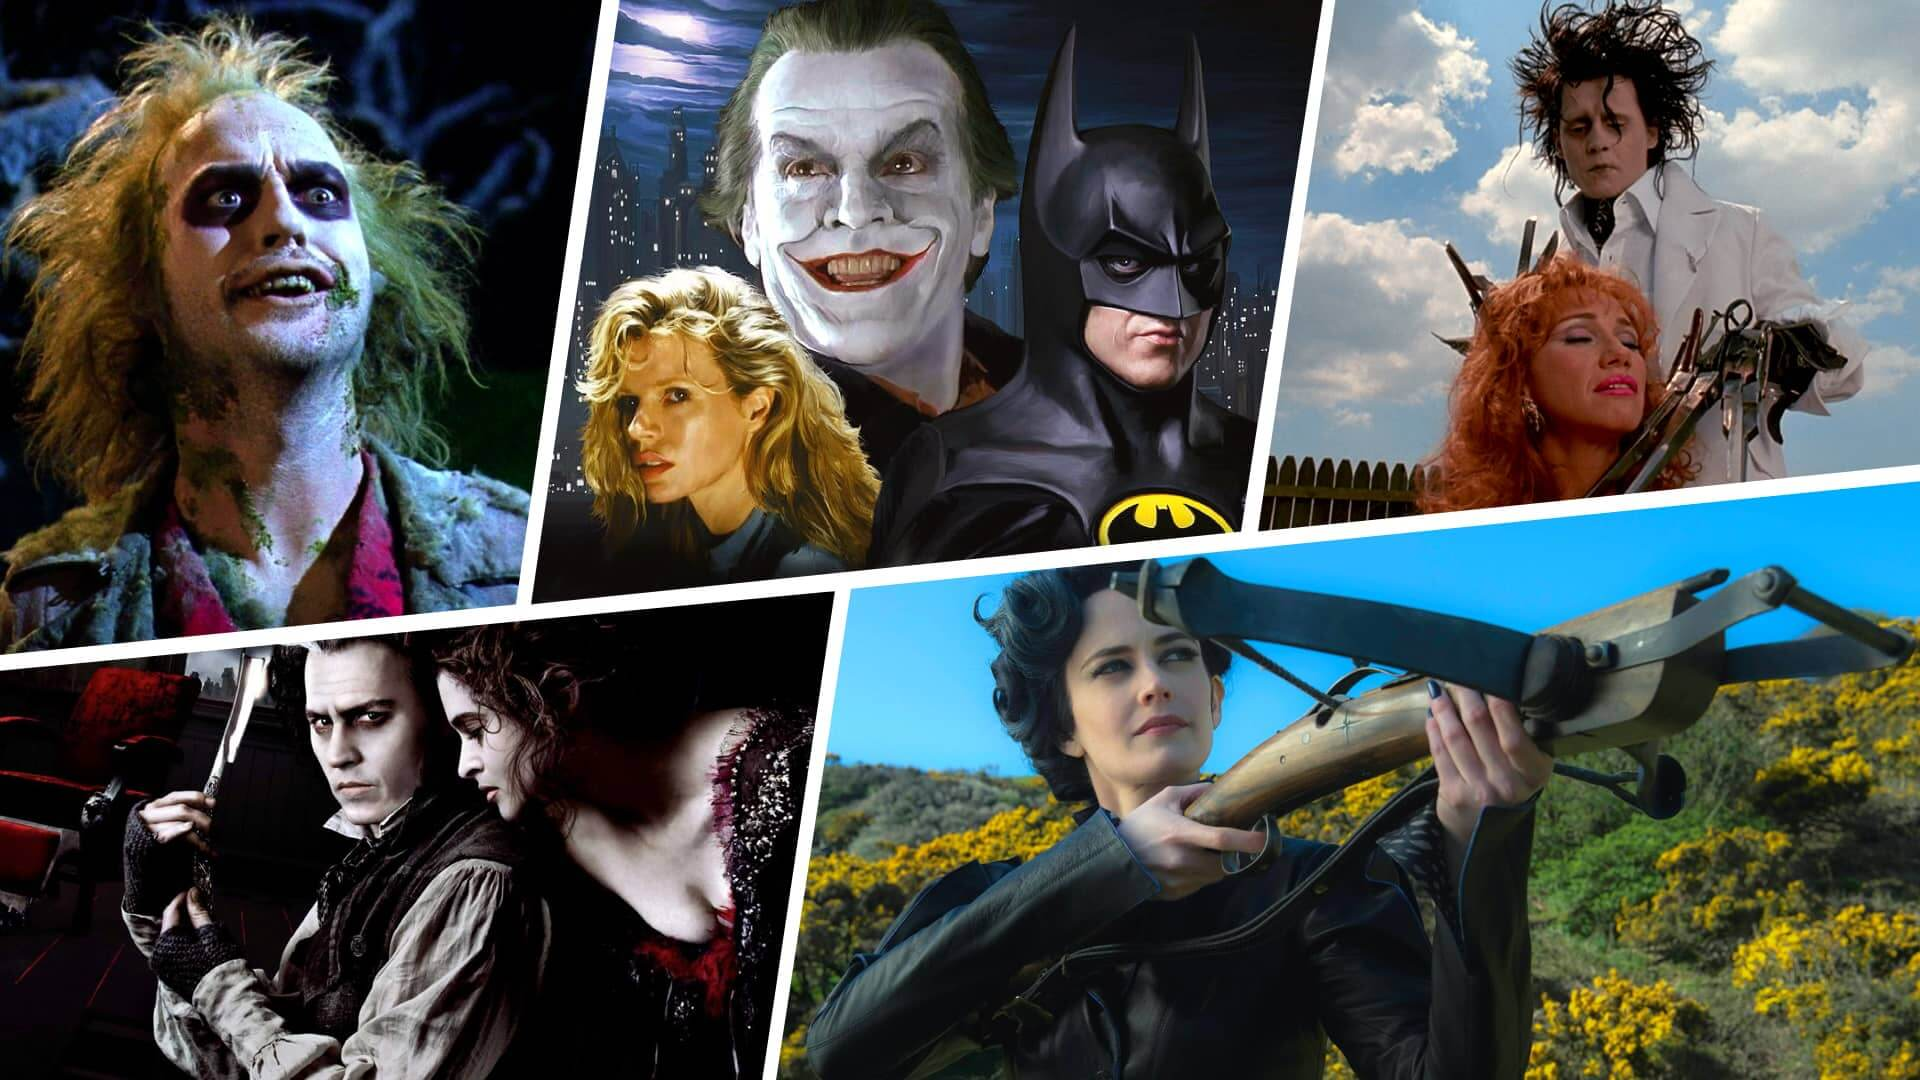 Química simpatía Disfraces  19 Best Tim Burton Movies — His Entire Filmography Ranked